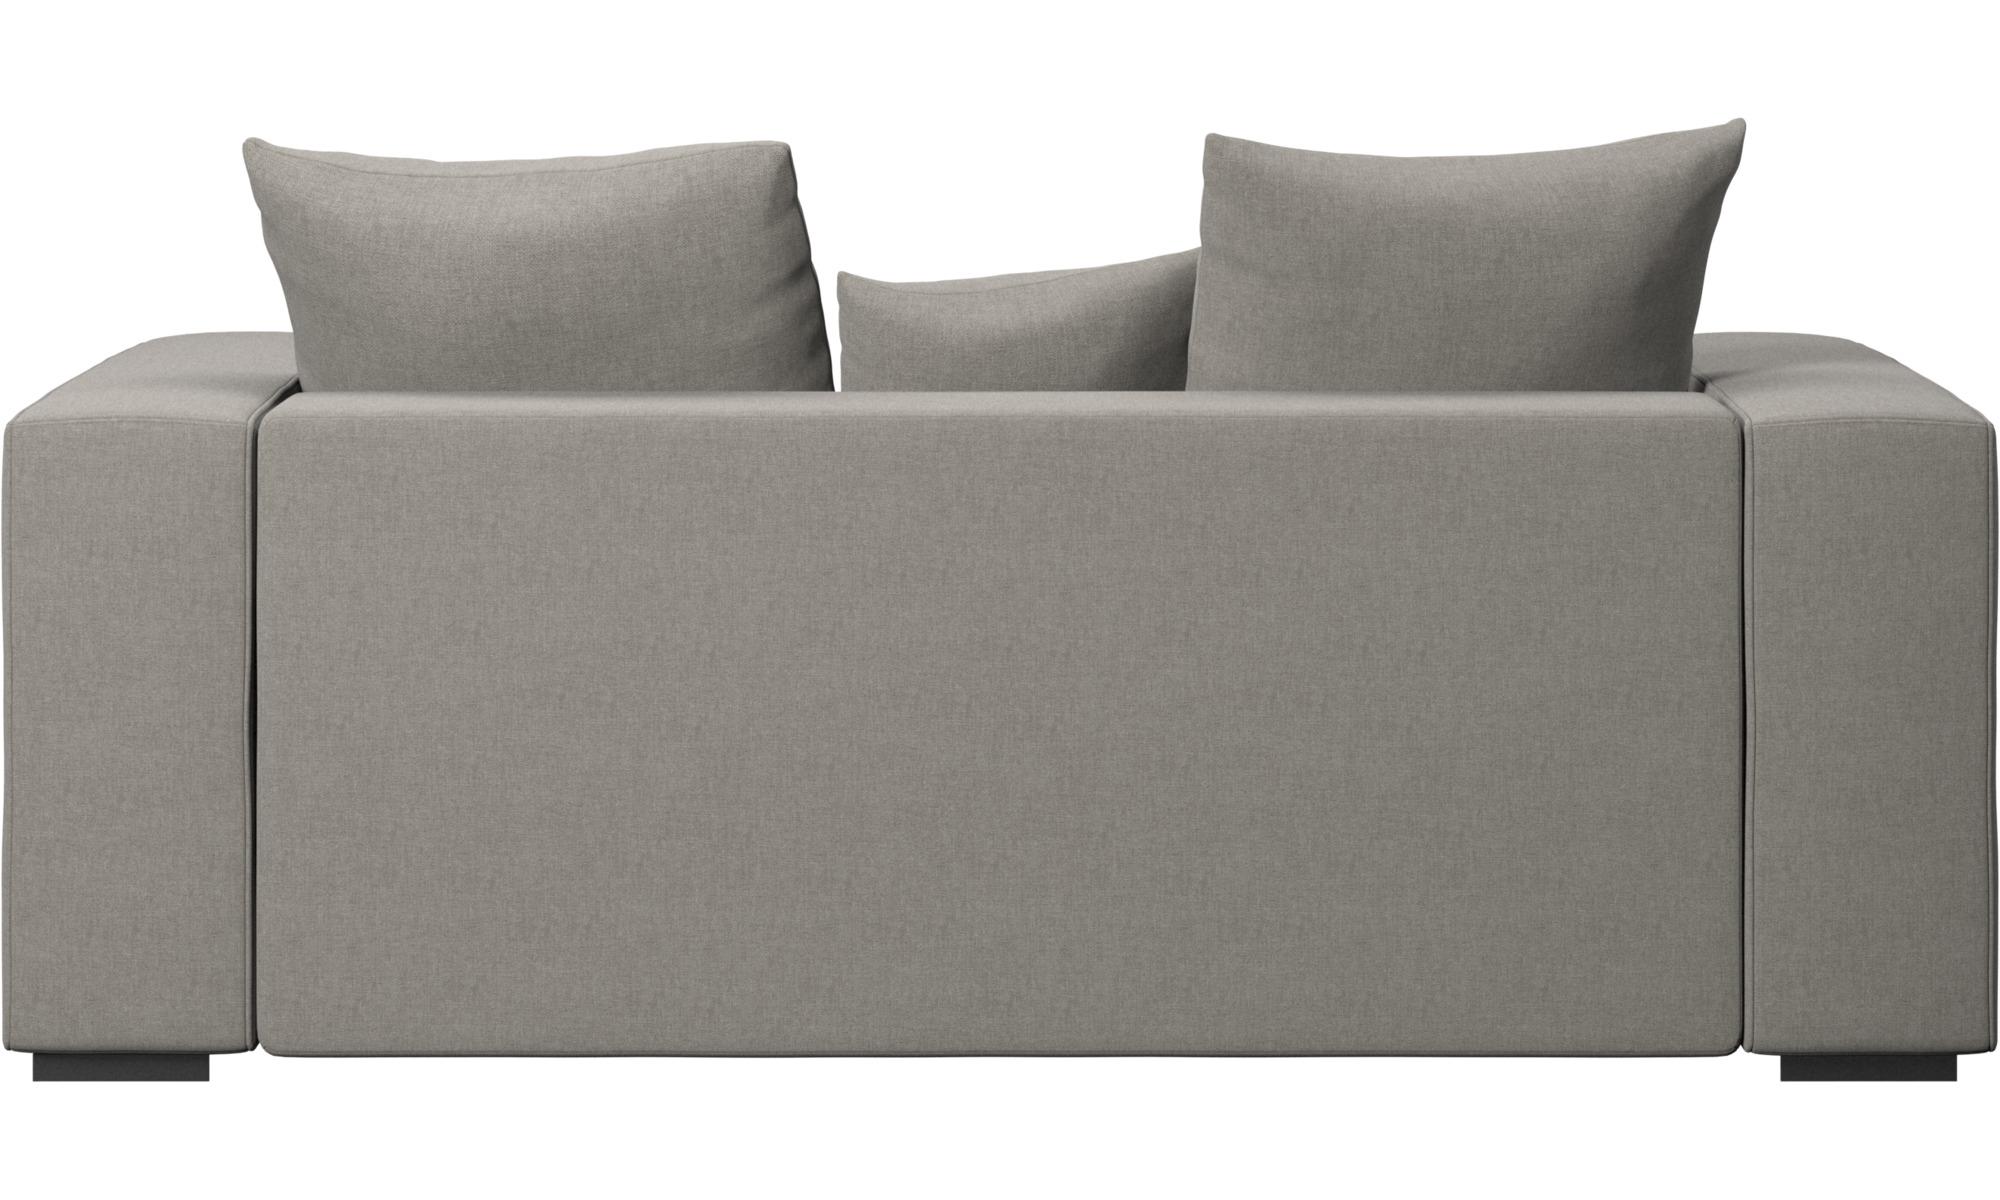 2 seater sofas cenova sofa boconcept. Black Bedroom Furniture Sets. Home Design Ideas